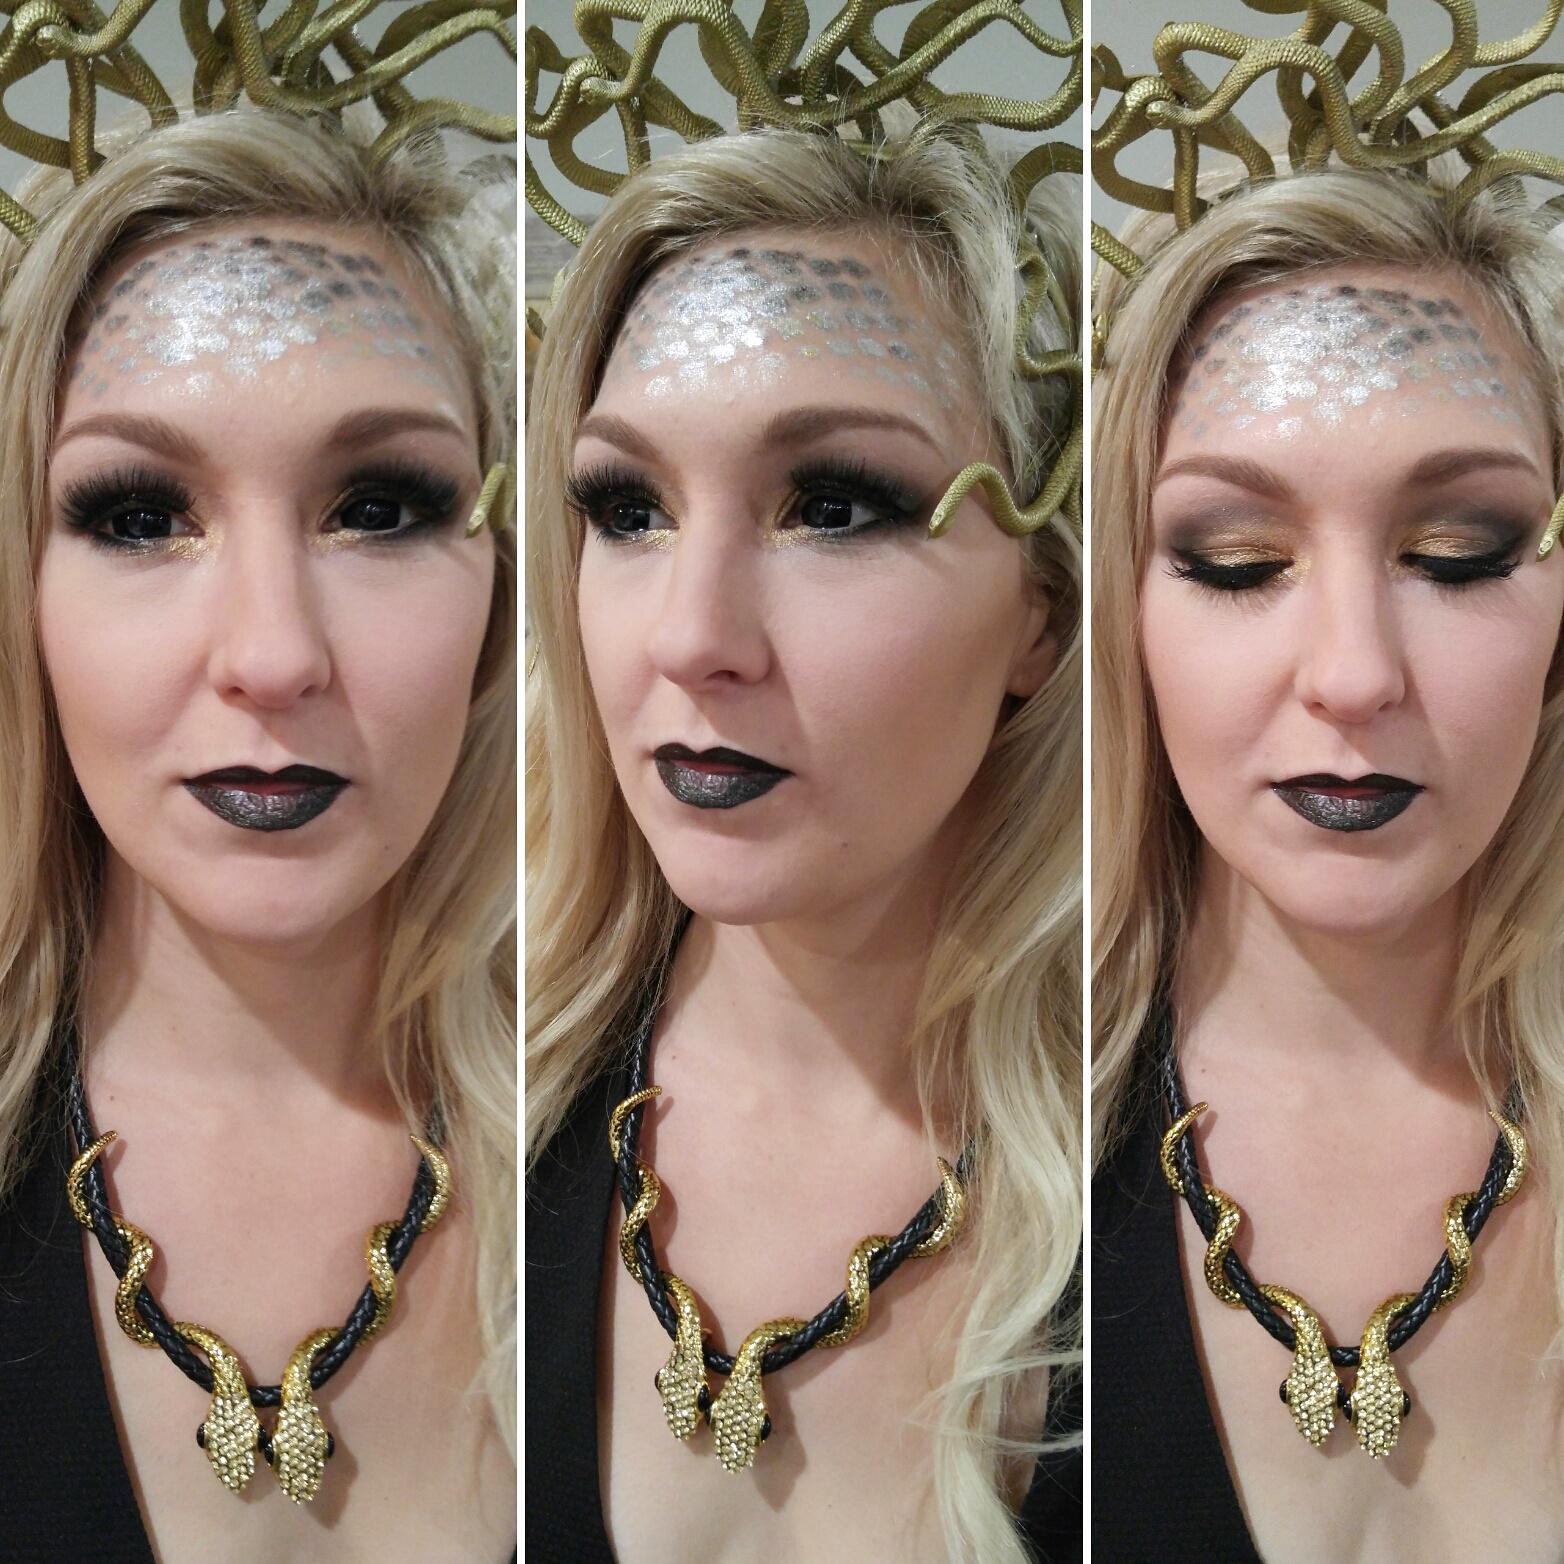 Medusa makeup halloween